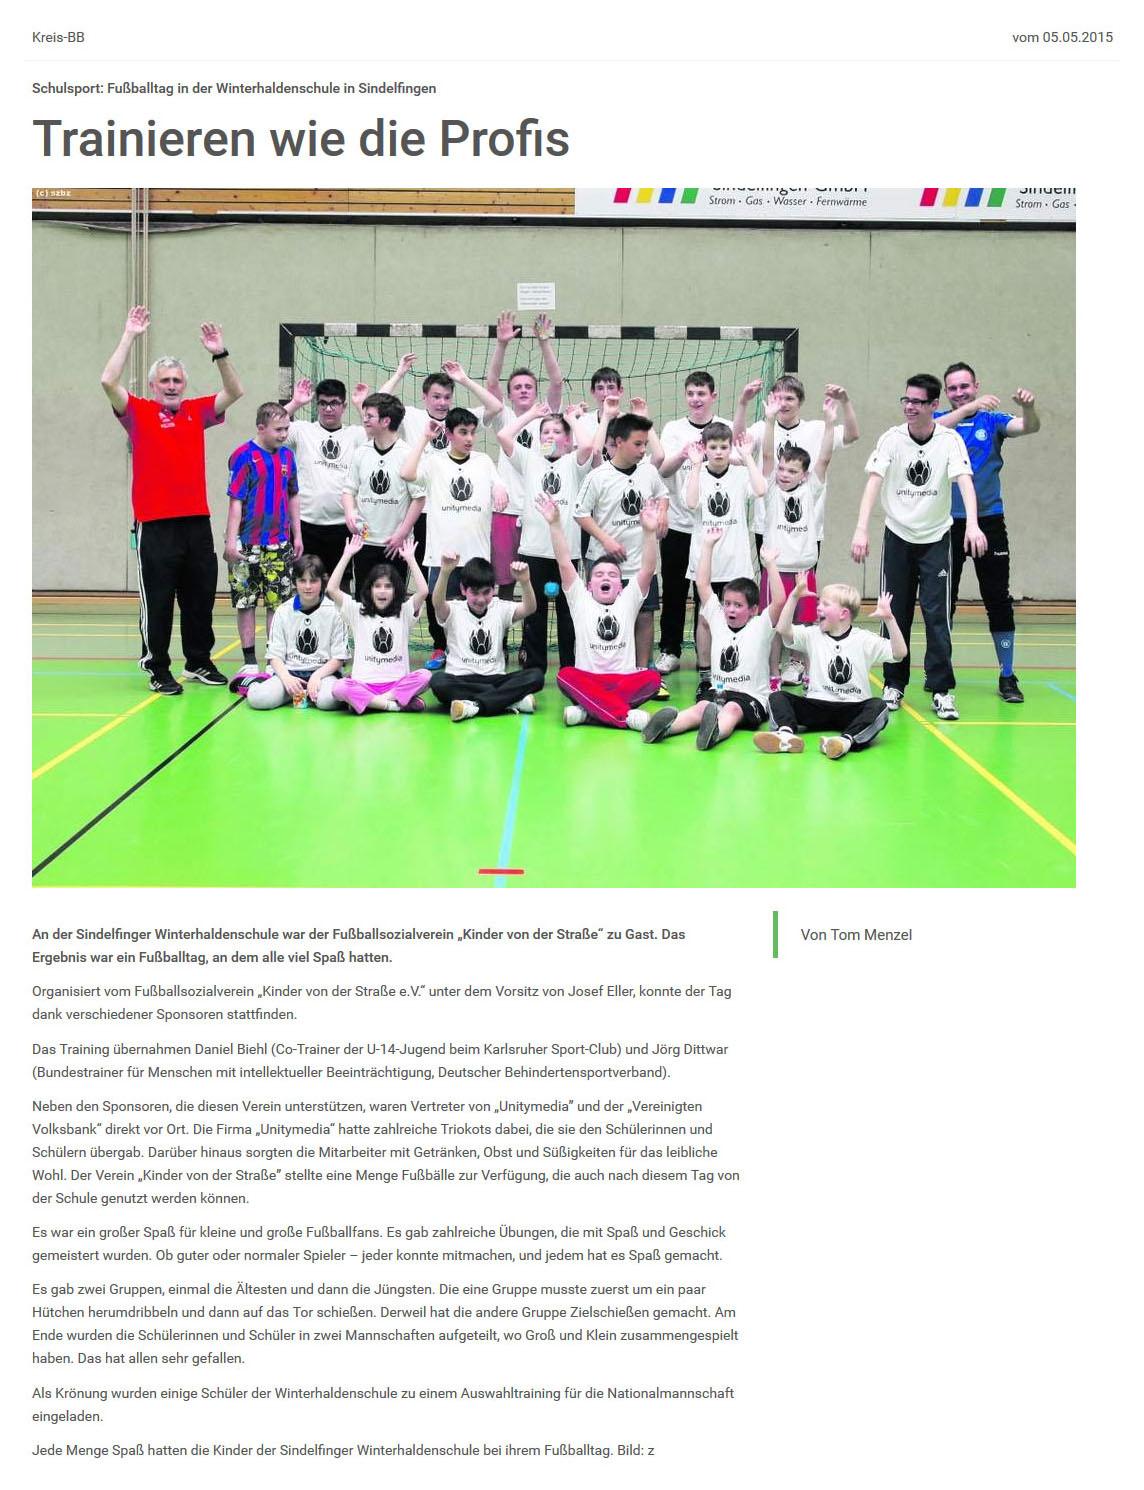 Sindelfinger  Boeblinger Zeitung vom 05052015 - Bild 1 - Datum: 05.05.2015 - Tags: Pressebericht, AKTION FUSSBALLTAG e.V.